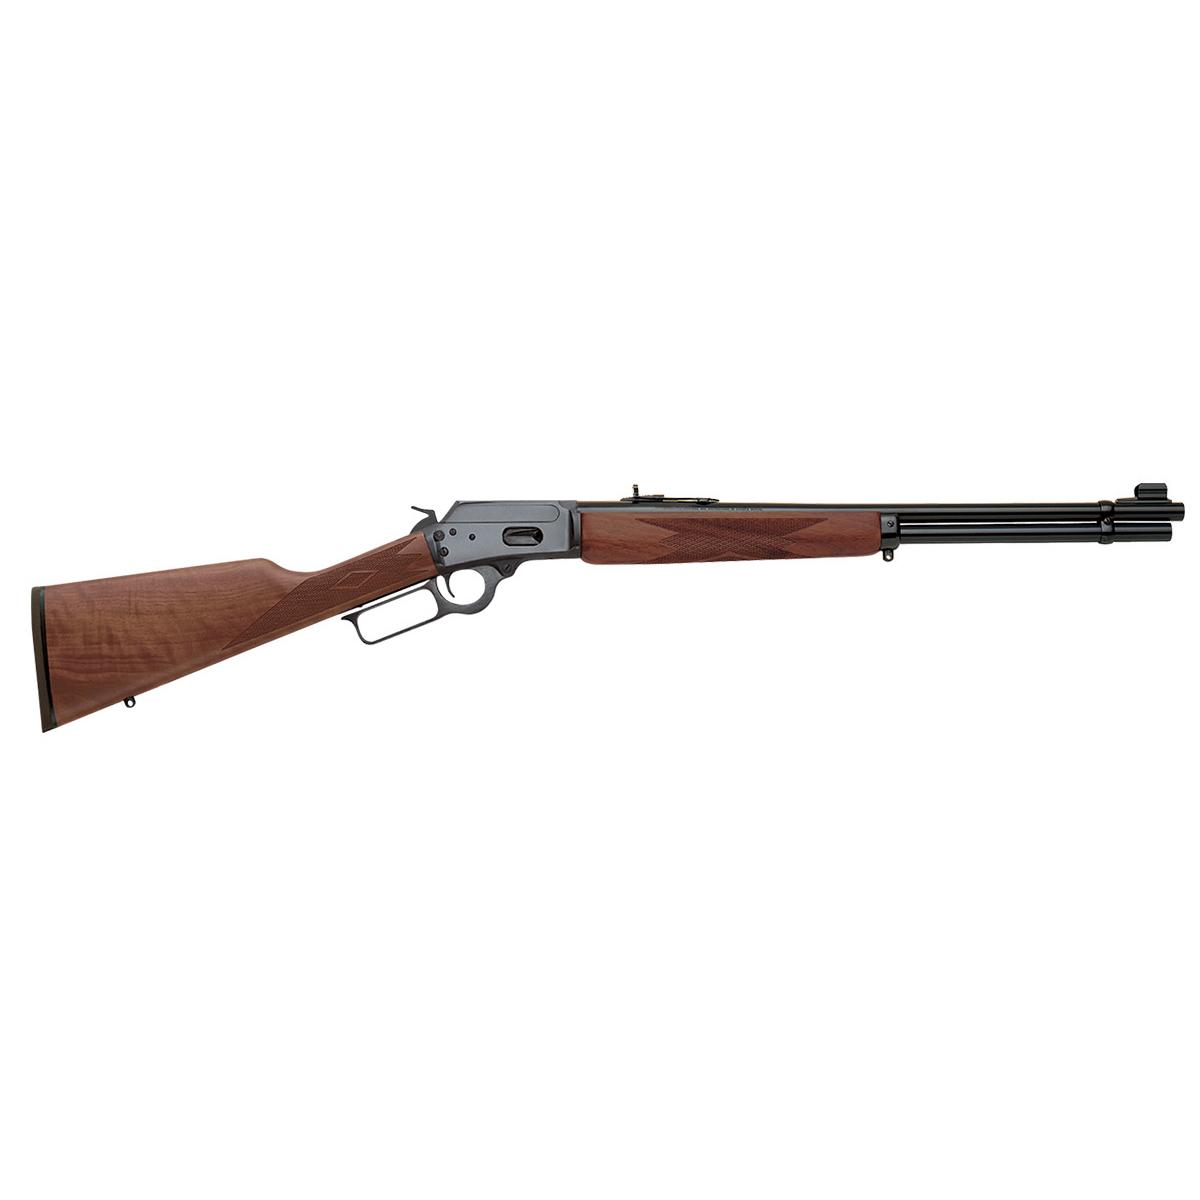 Marlin Model 1894 Centerfire Rifle, .44 Rem. Mag.